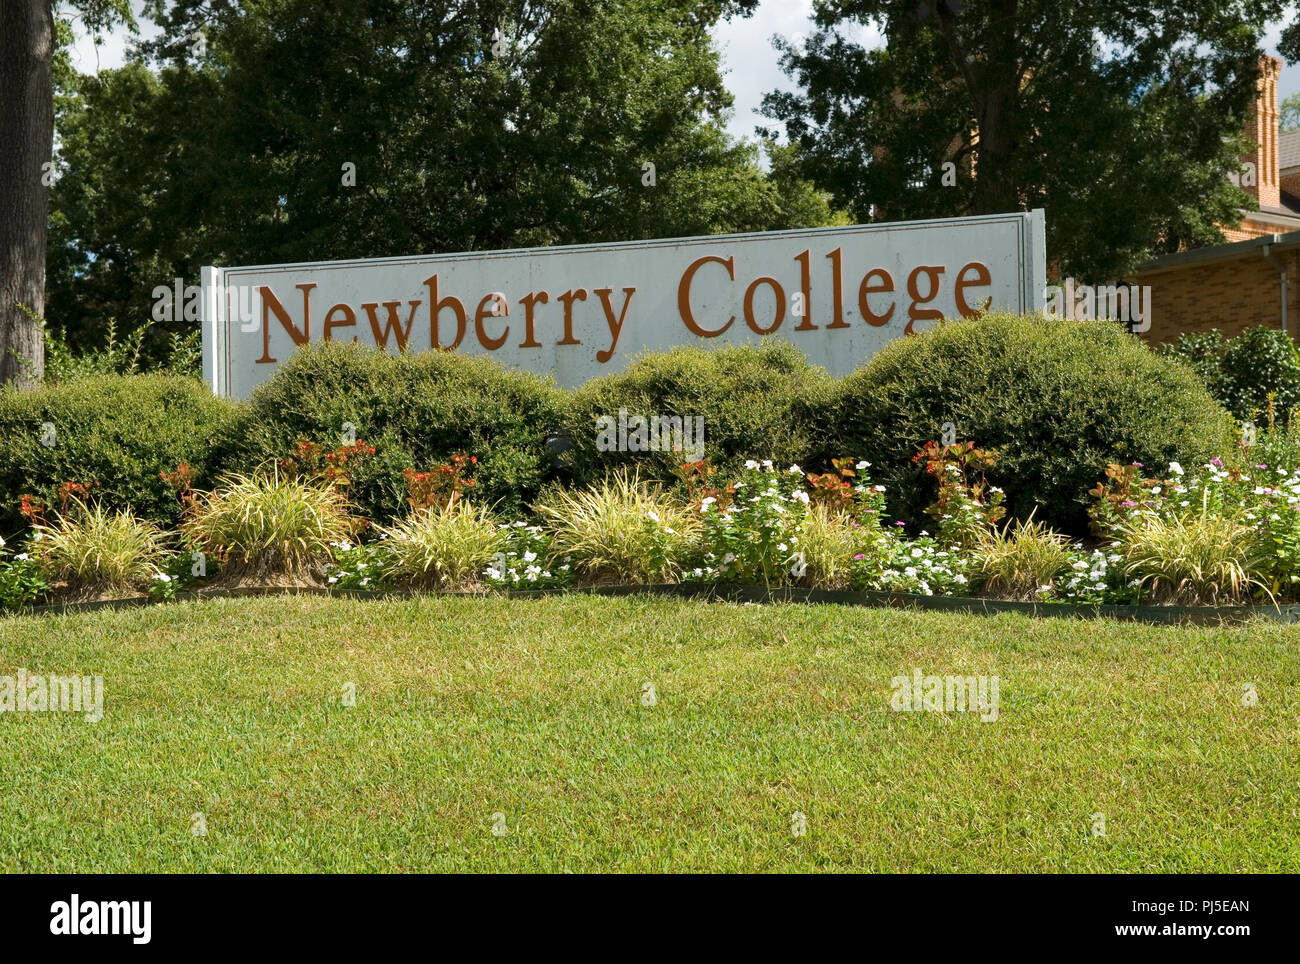 Newberry College sign South Carolina, USA. - Stock Image